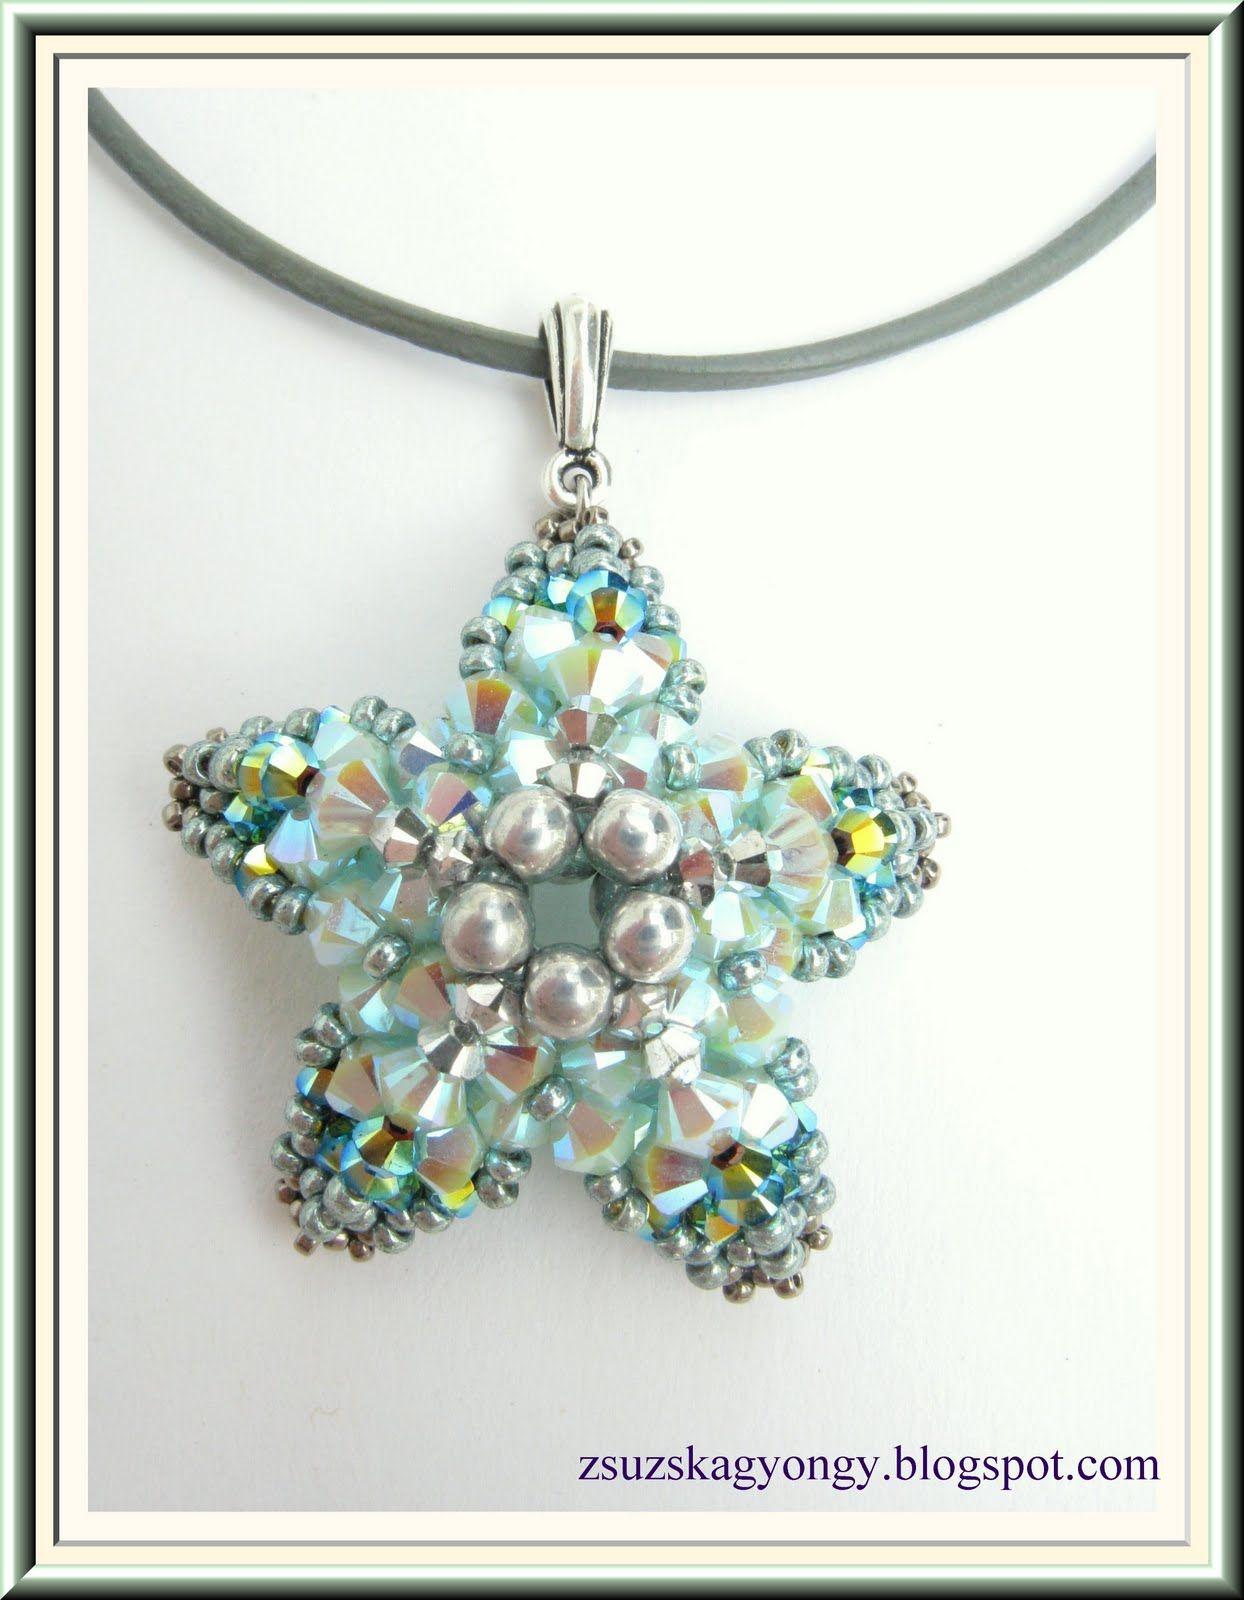 Zsuzska gyöngyvilága: Starfish (Pattern by Sabine Lippert)